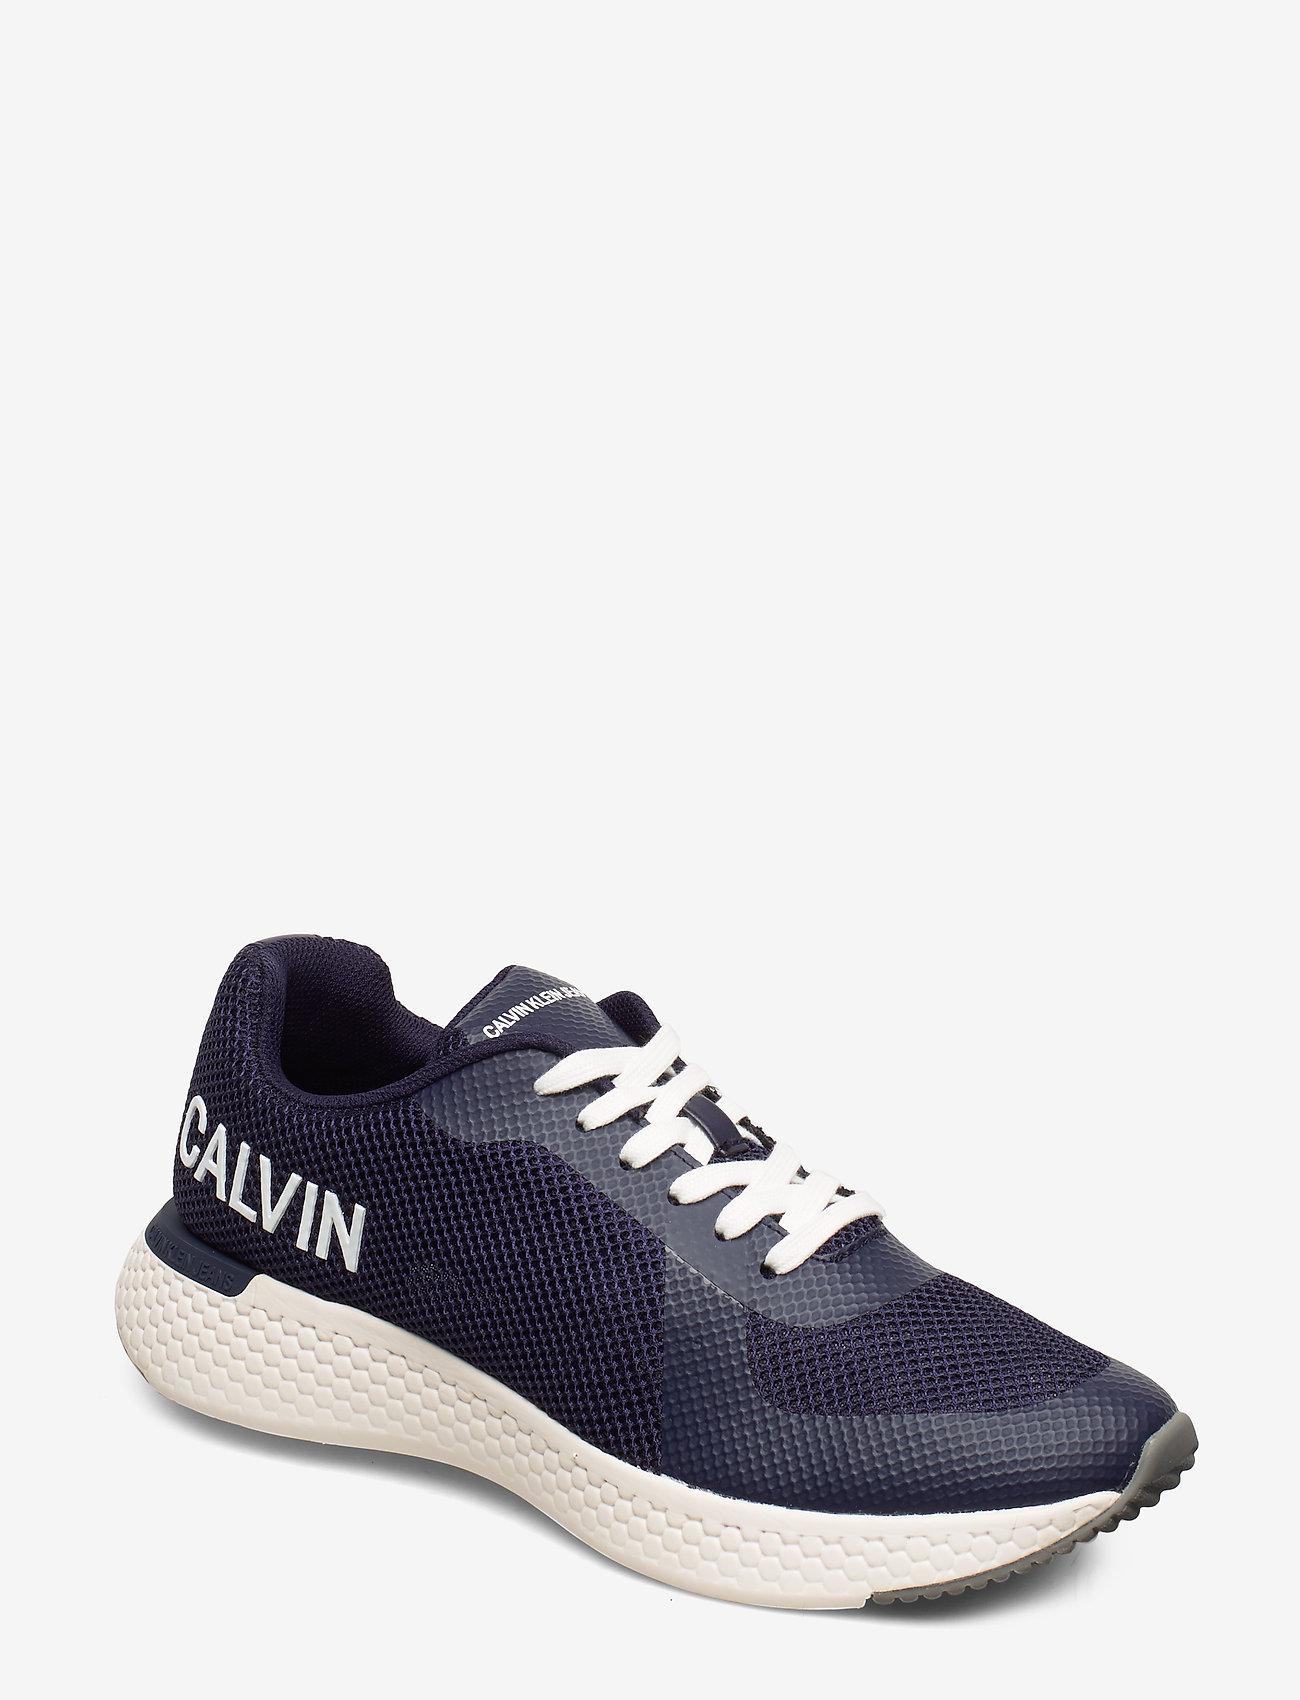 Calvin Klein - AMOS MESH/HF - laag sneakers - navy - 0